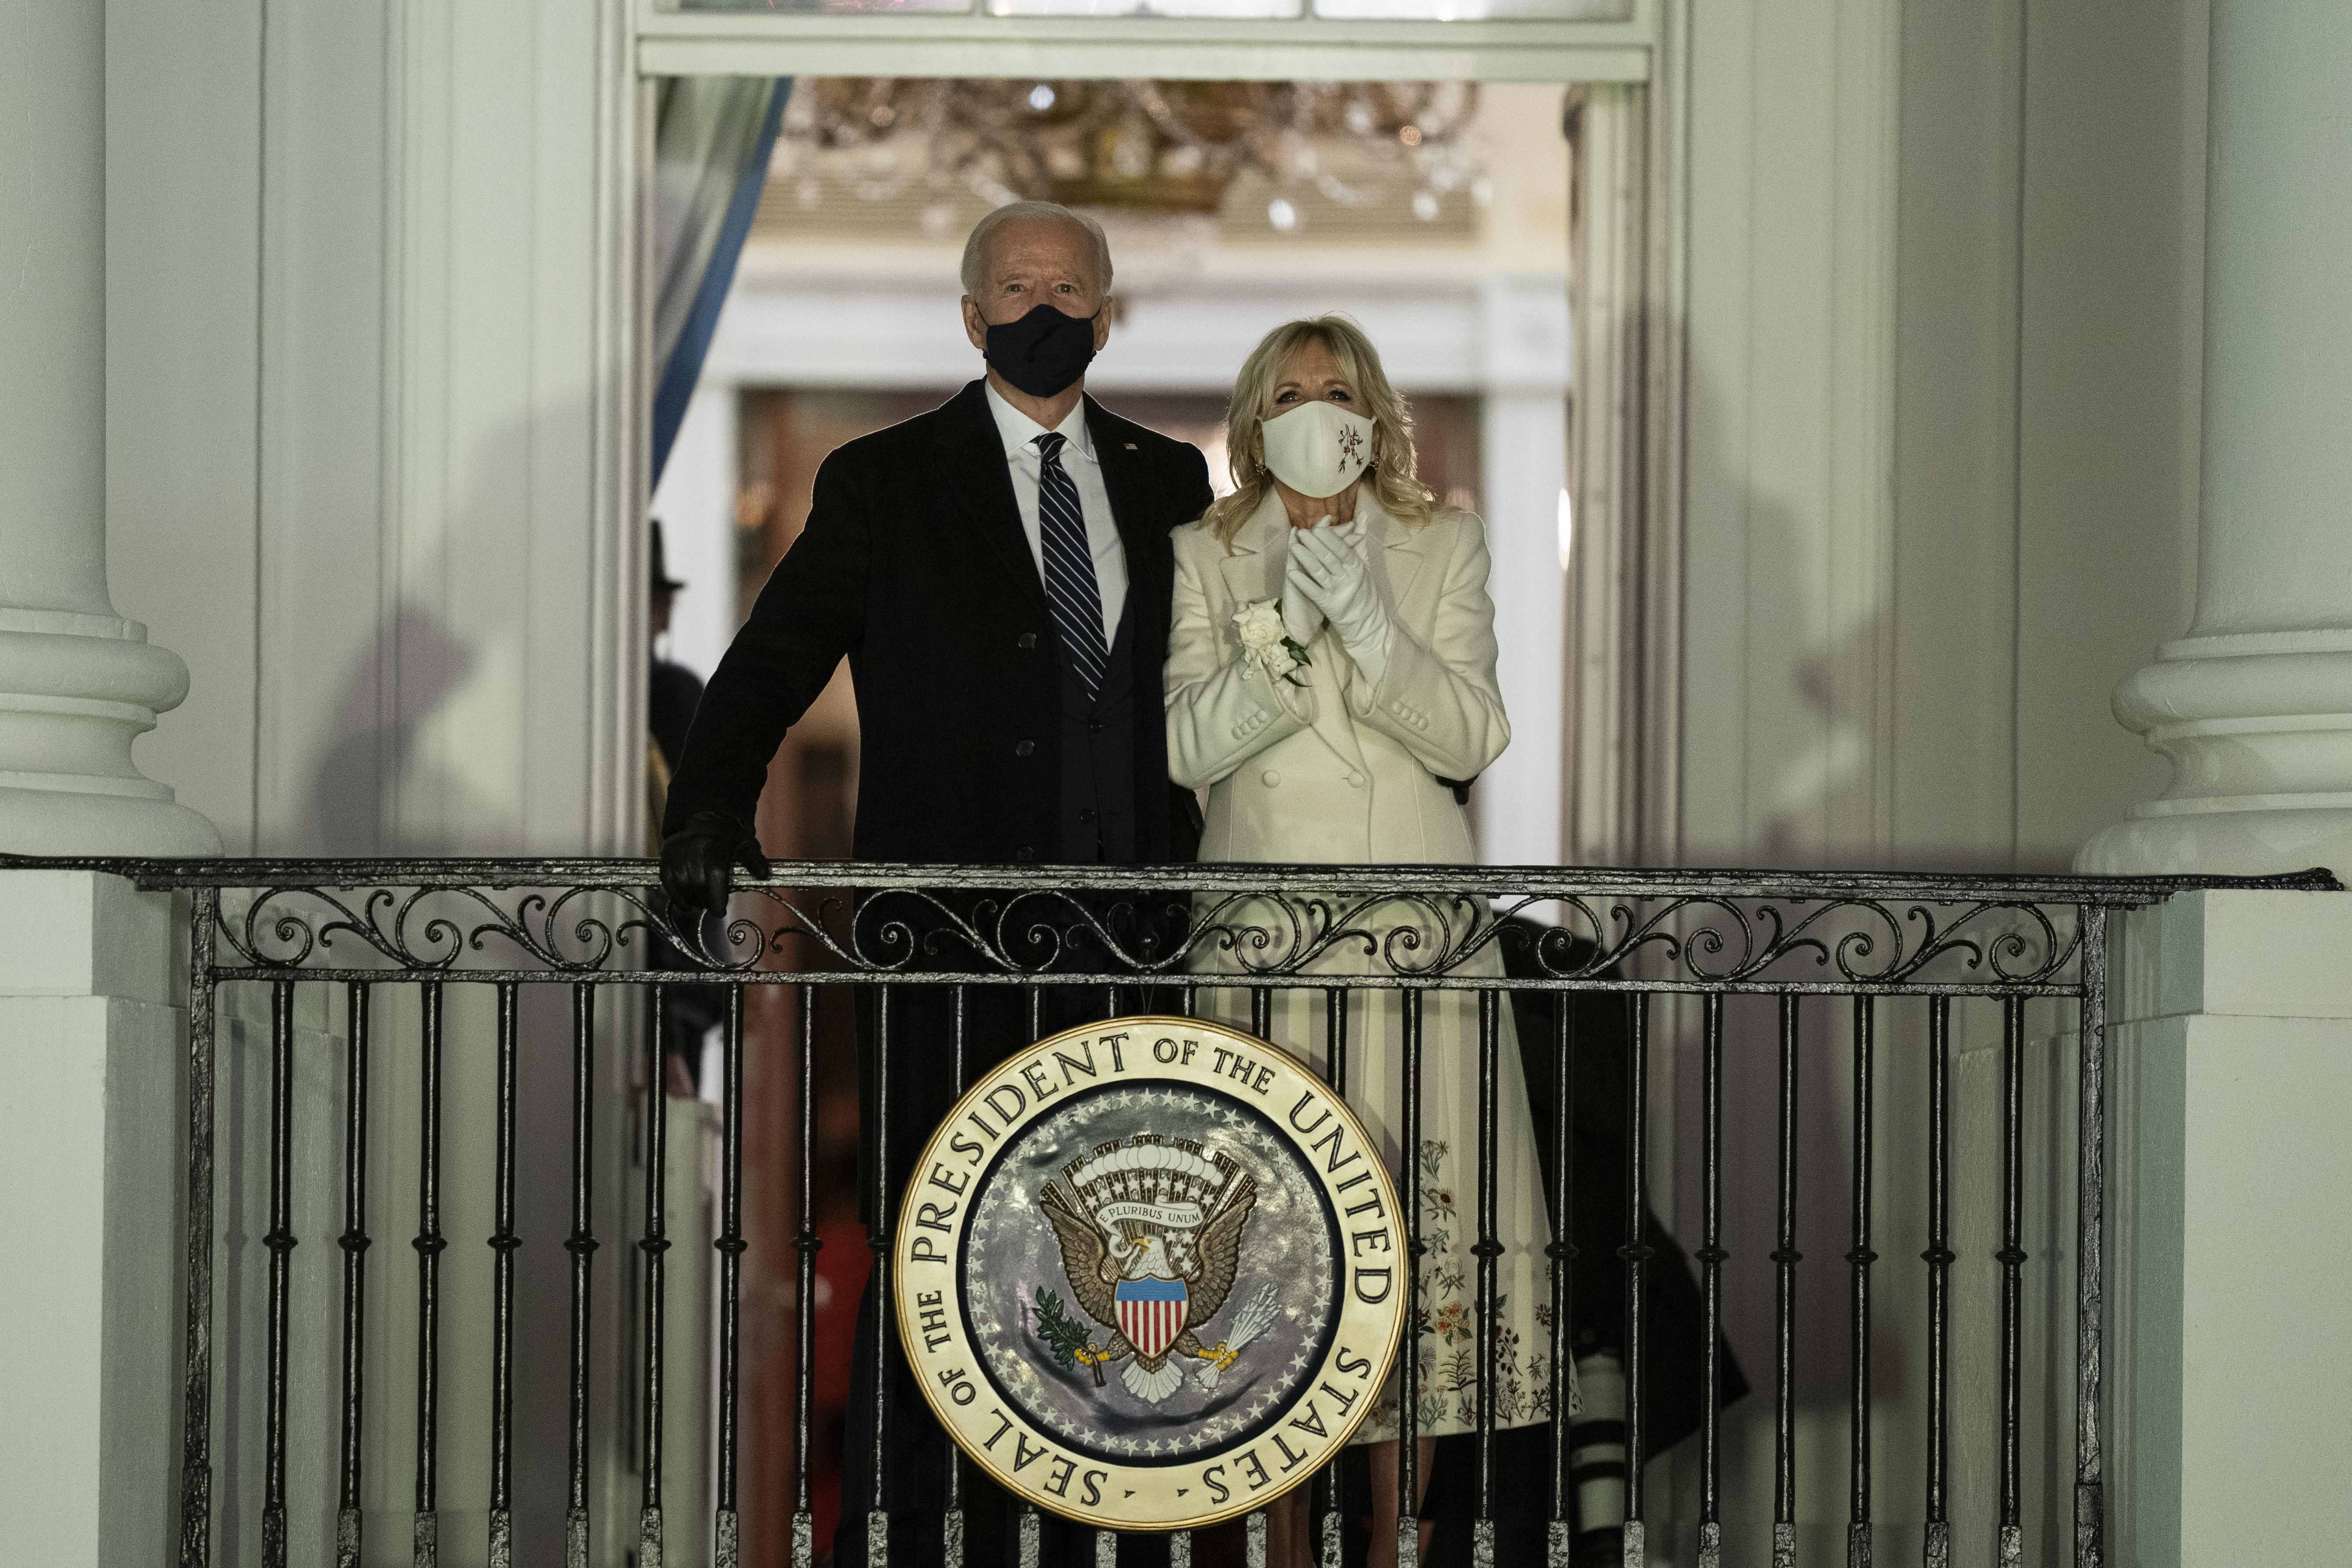 President Joe Biden and first lady Jill Biden watch fireworks from the White House, Wednesday, Jan. 20, 2021, in Washington. (AP Photo/Evan Vucci)